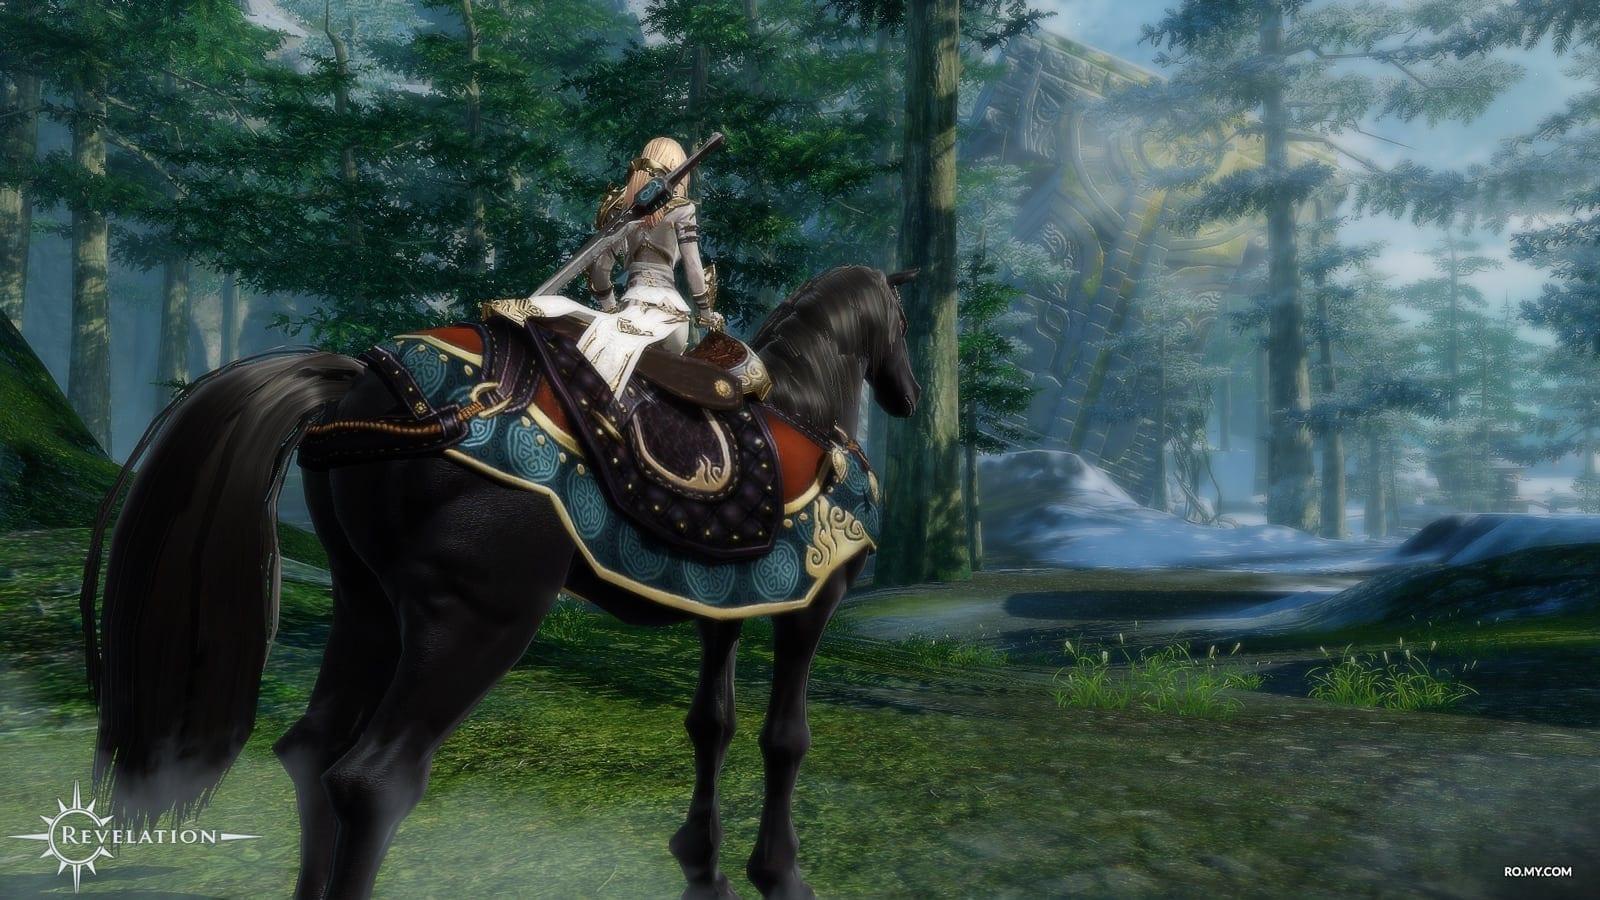 Revelation Online screenshot 3